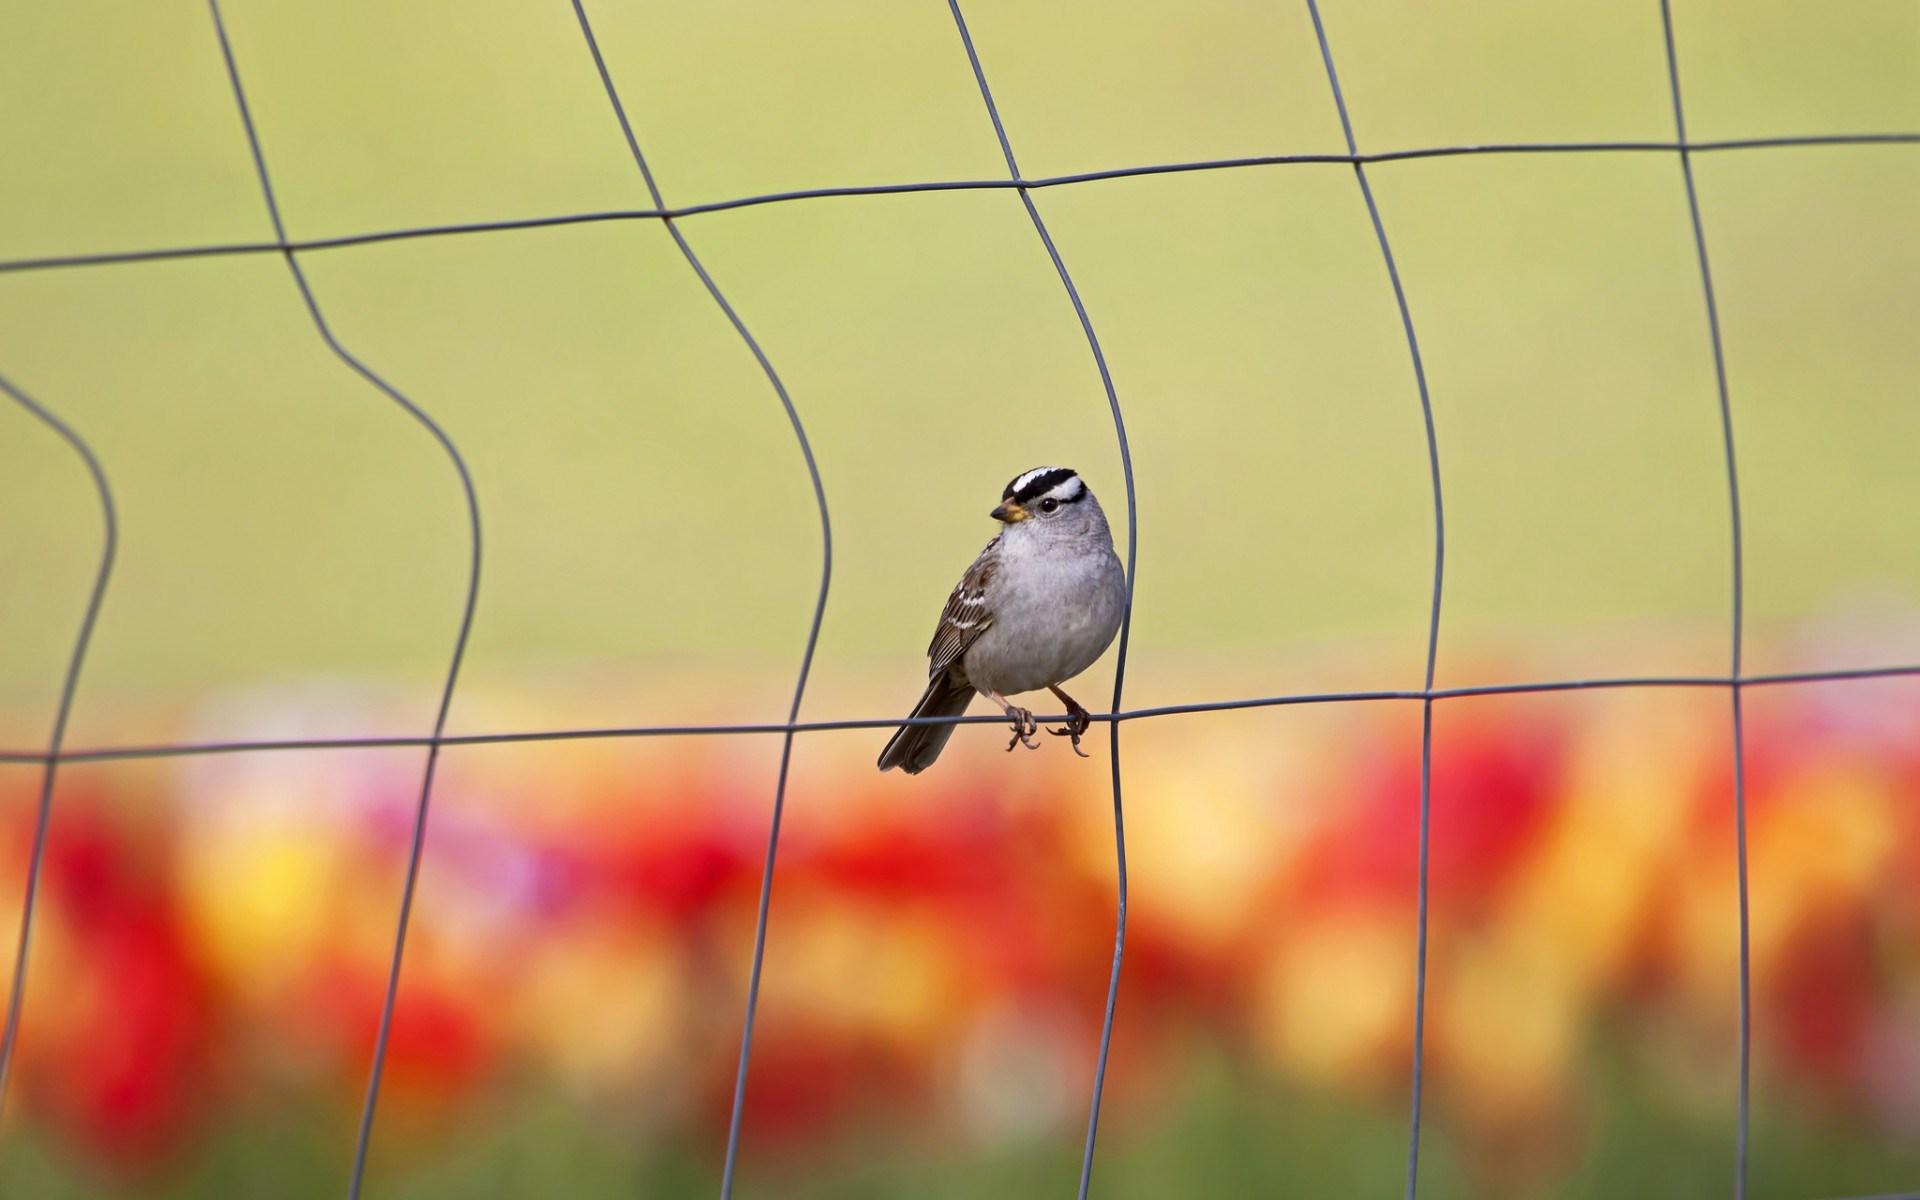 bird fence wallpaper 44181